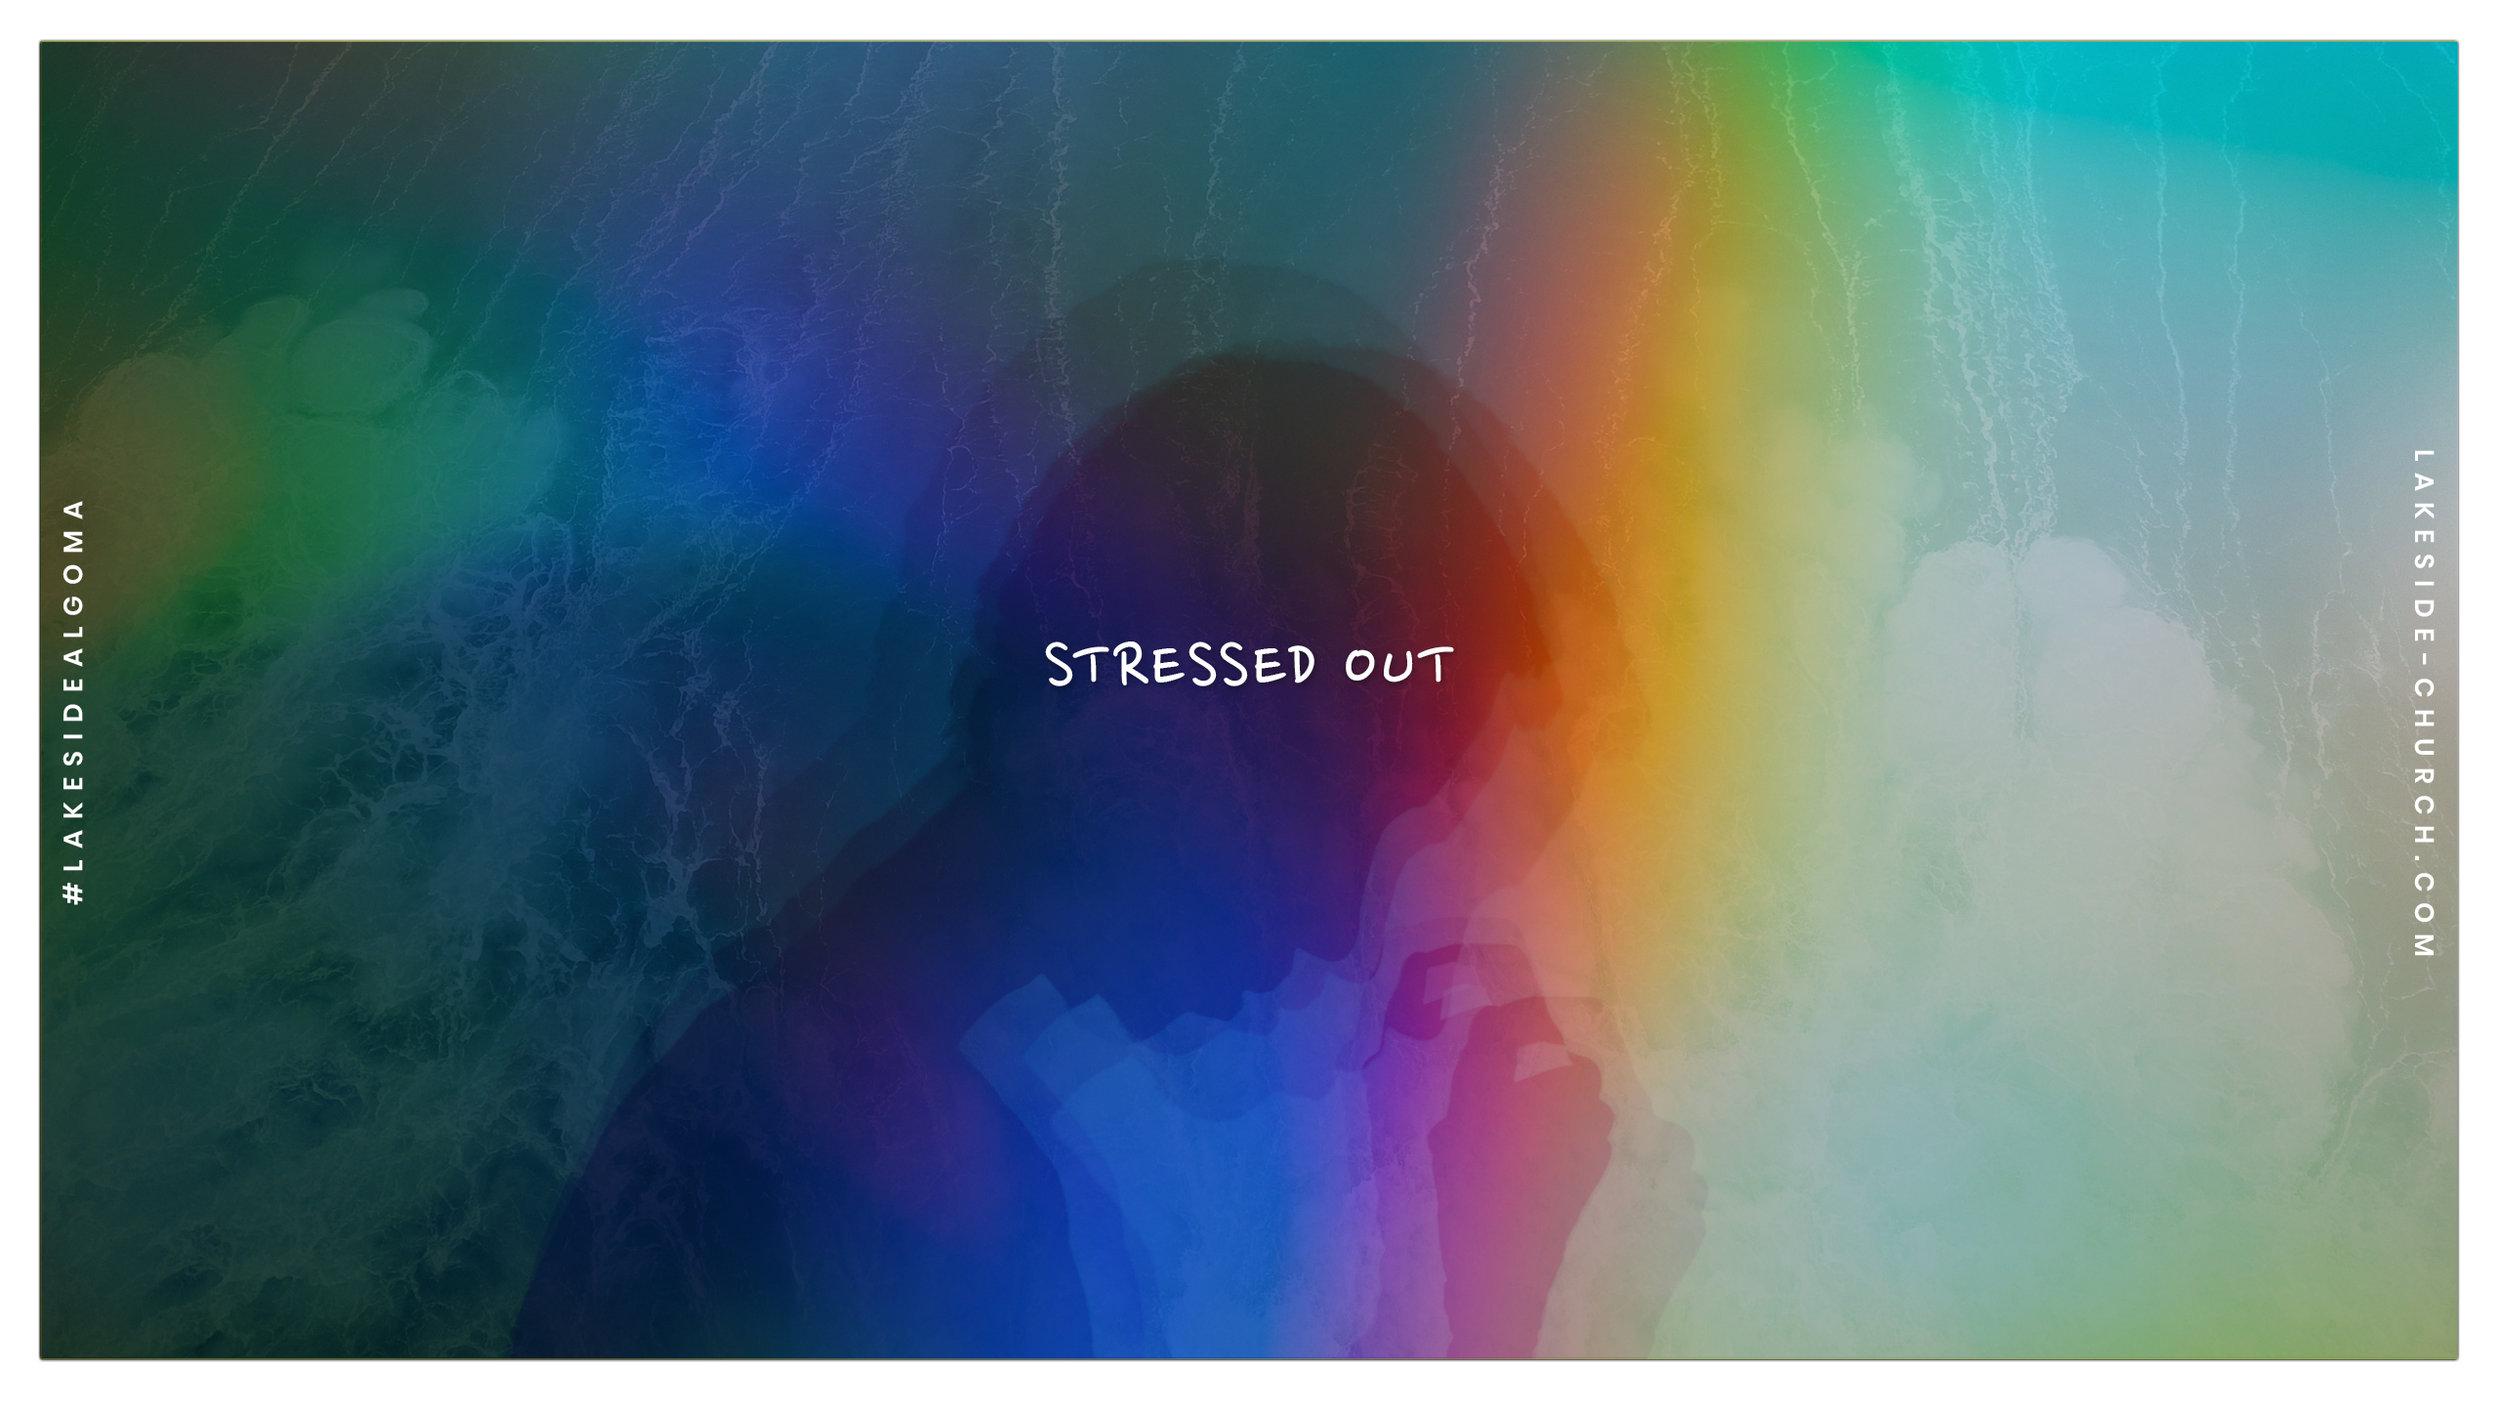 stressedout_slide.jpg